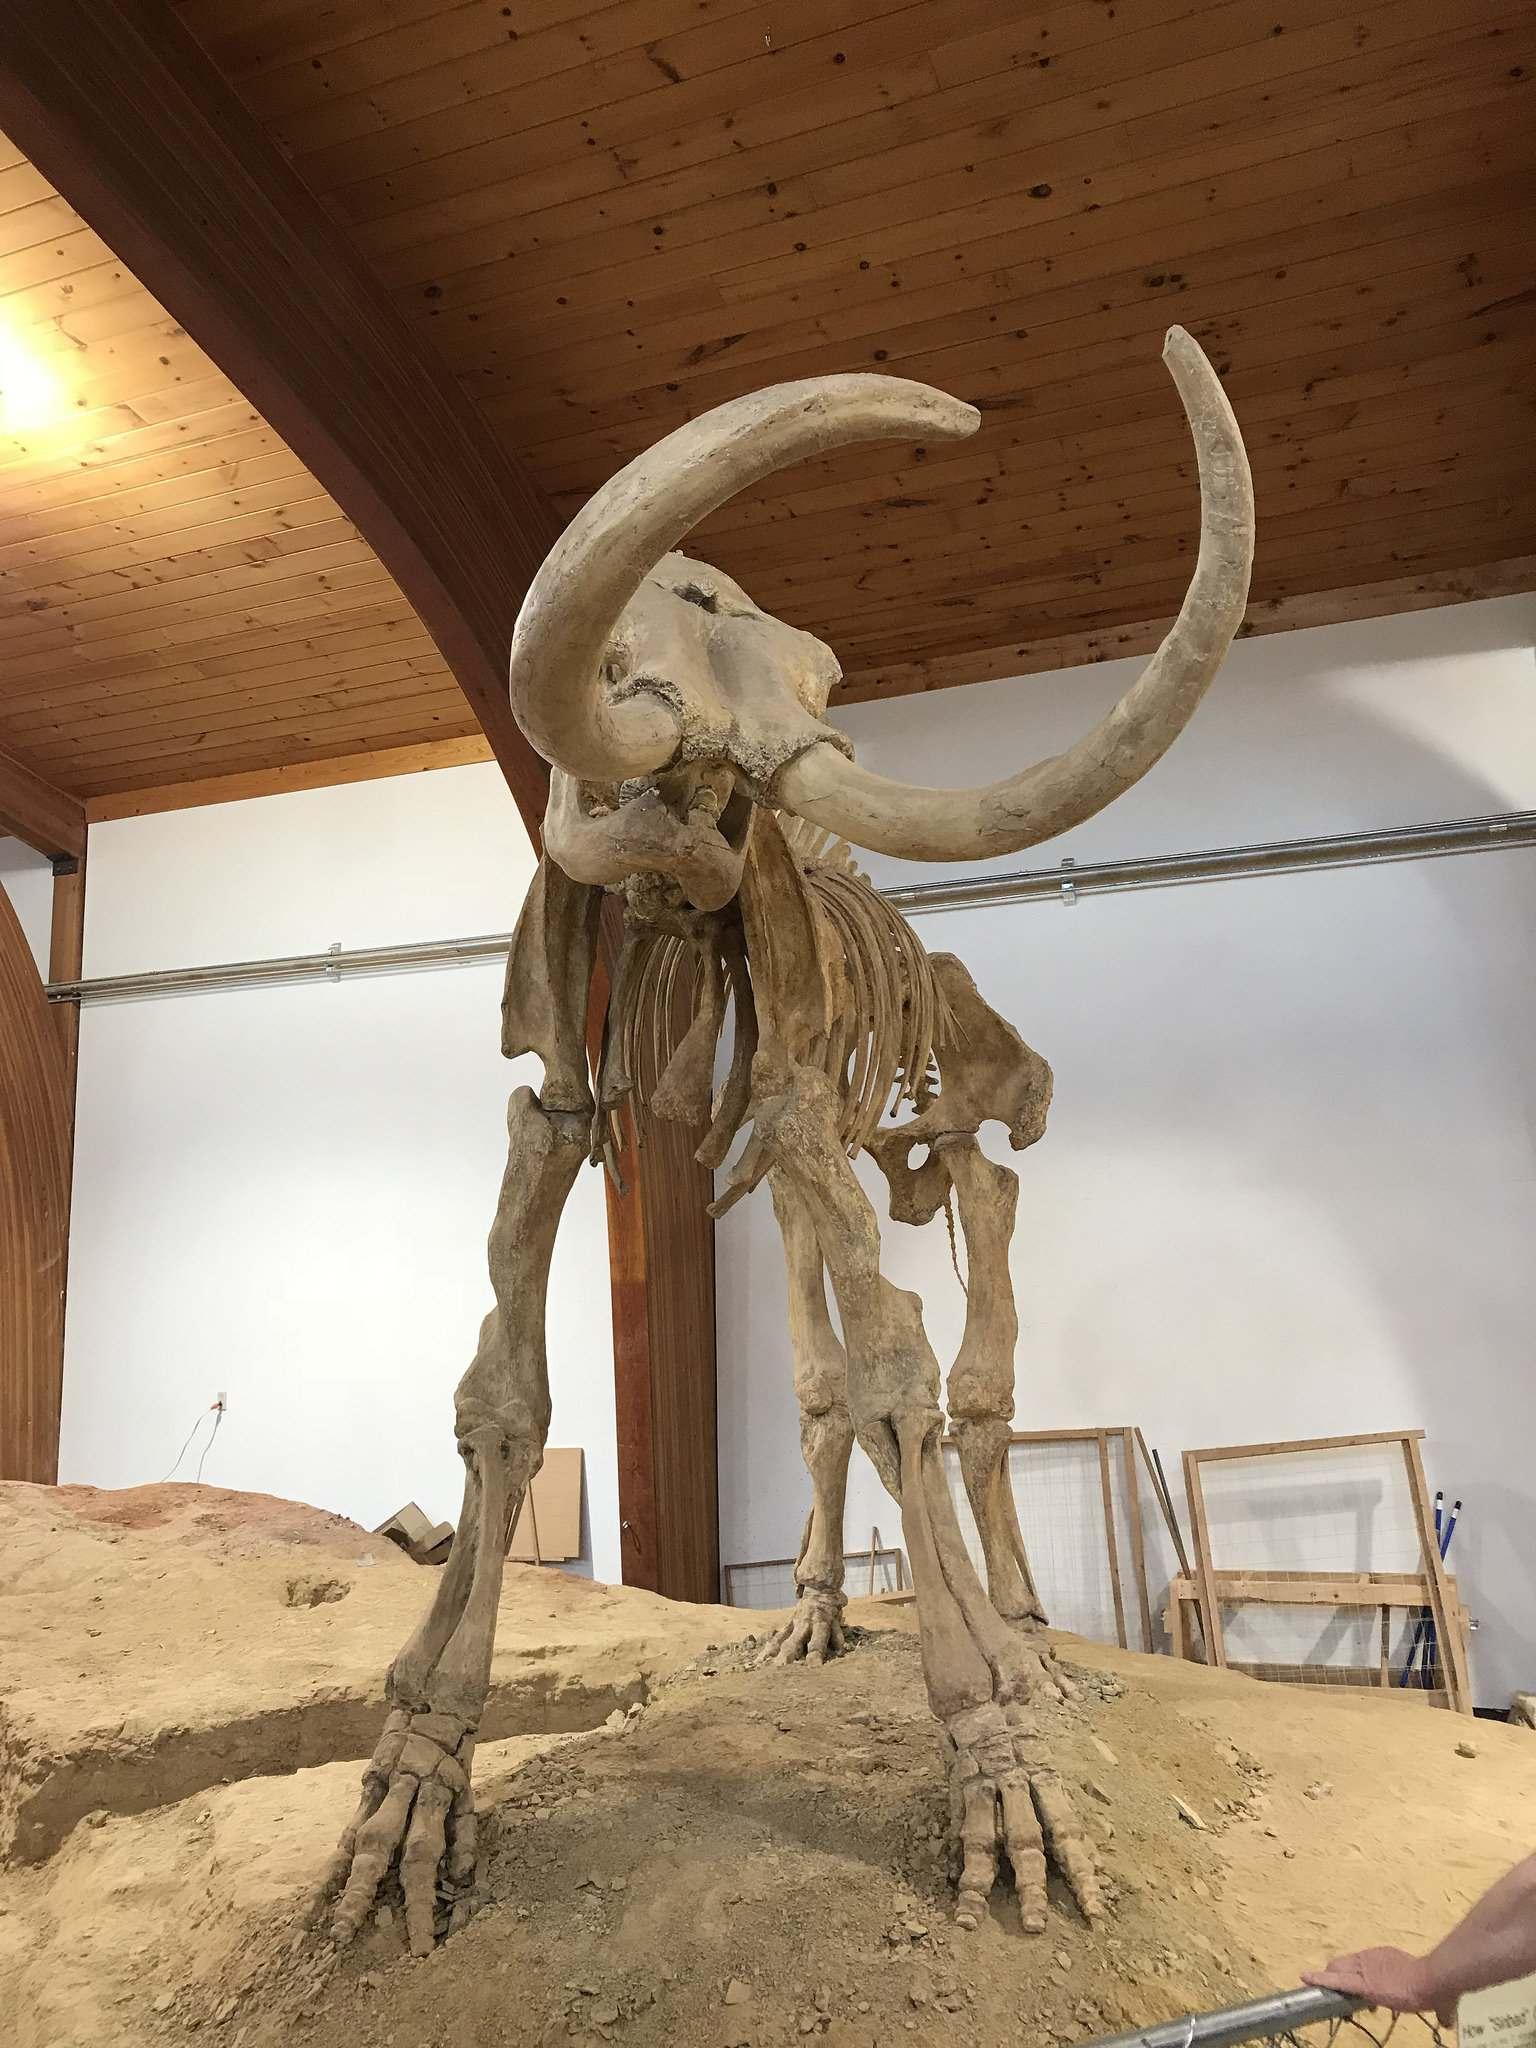 mammoth site9 Mammoth Site of Hot Springs in South Dakota